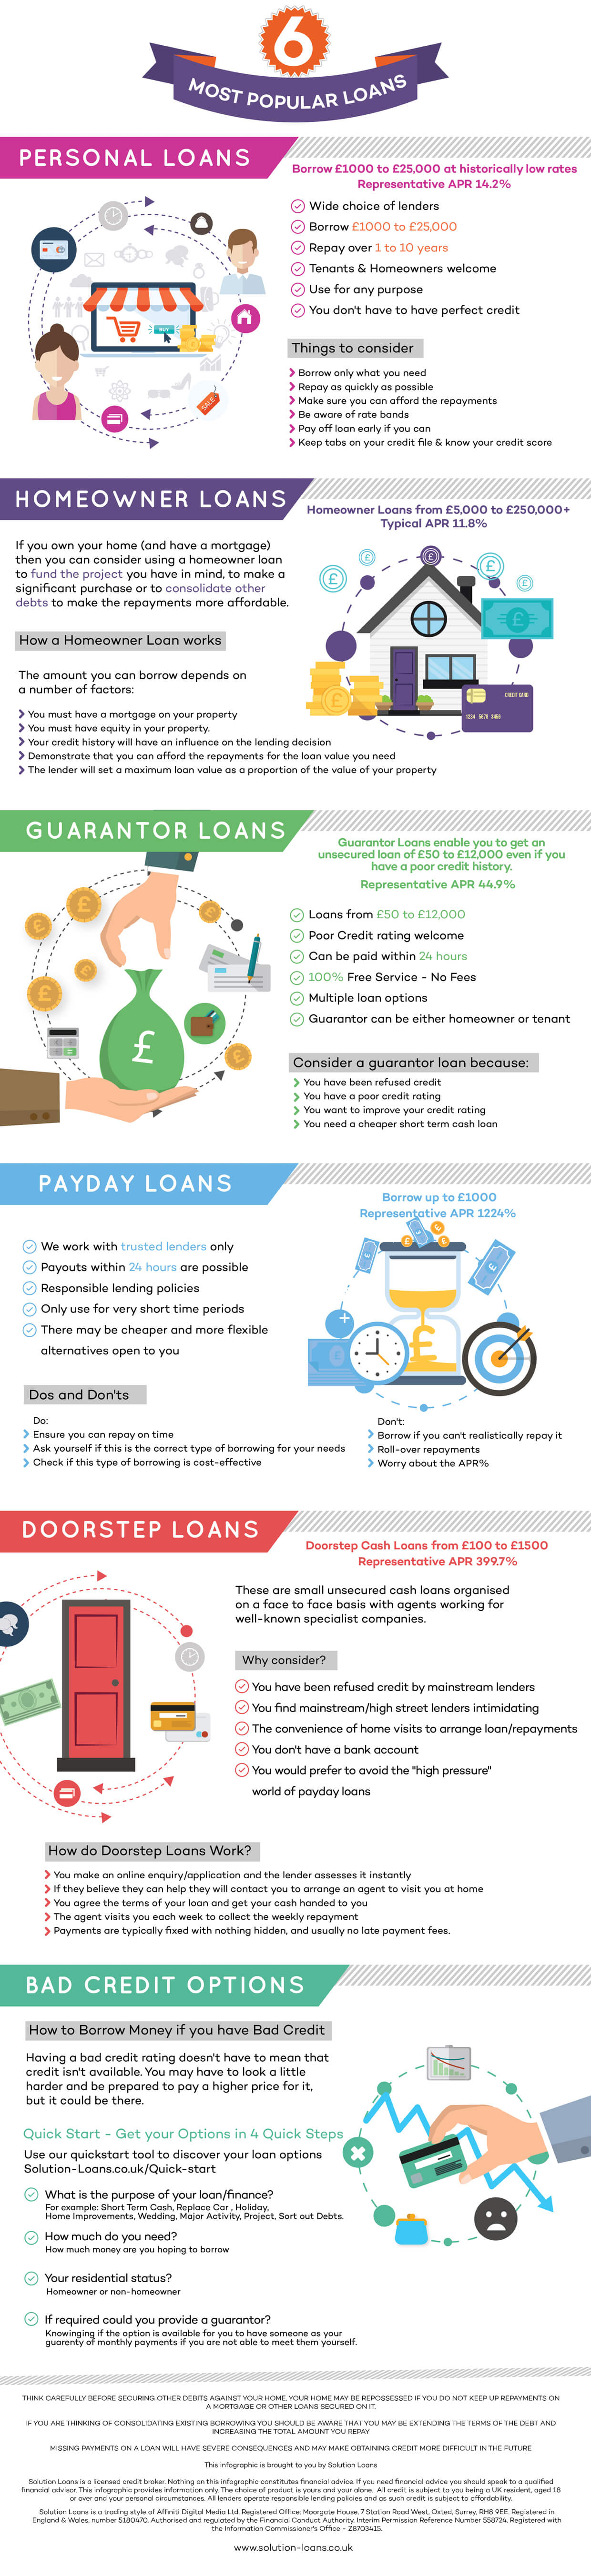 6-most-popular-loans